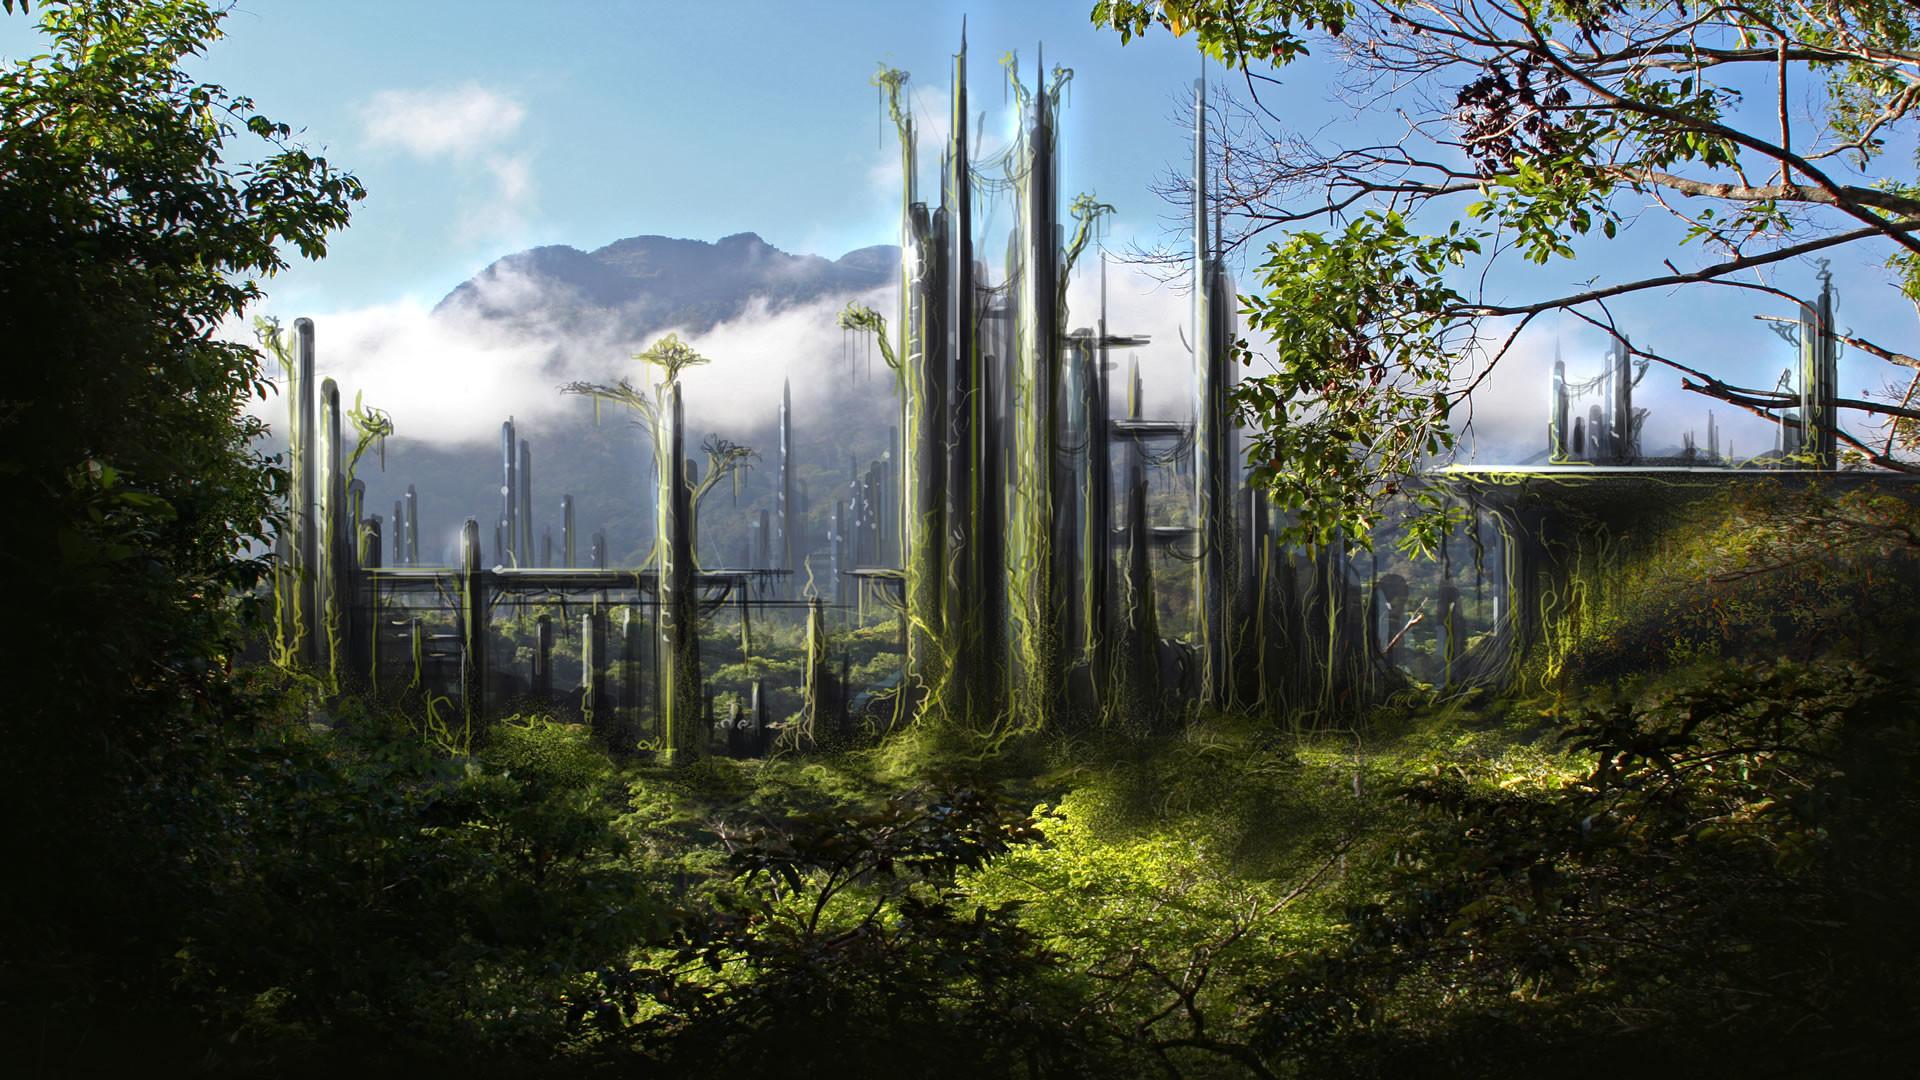 https://all-images.net/fond-ecran-science-fiction-hd-513/ Check more at  https://all-images.net/fond-ecran-science-fiction-hd-513/   Pinterest